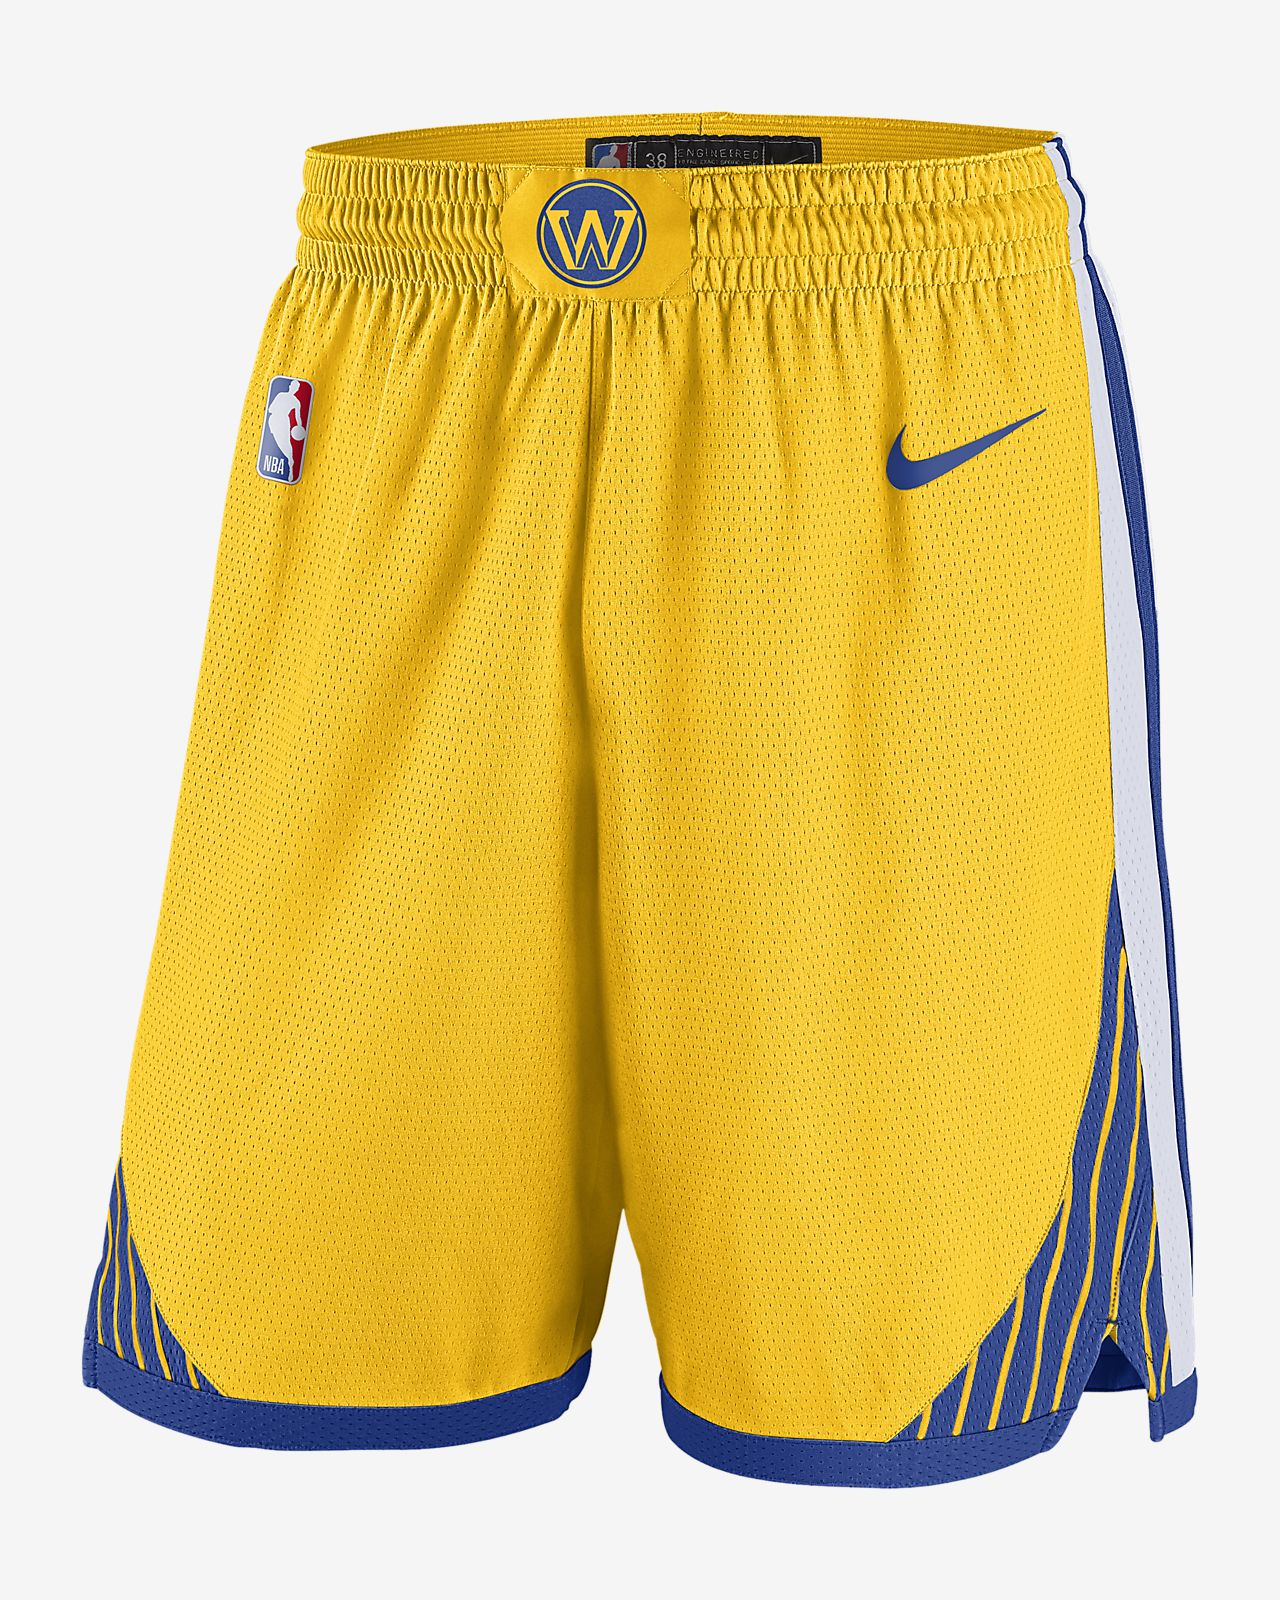 NBA-shorts Golden State Warriors Statement Edition Swingman för män